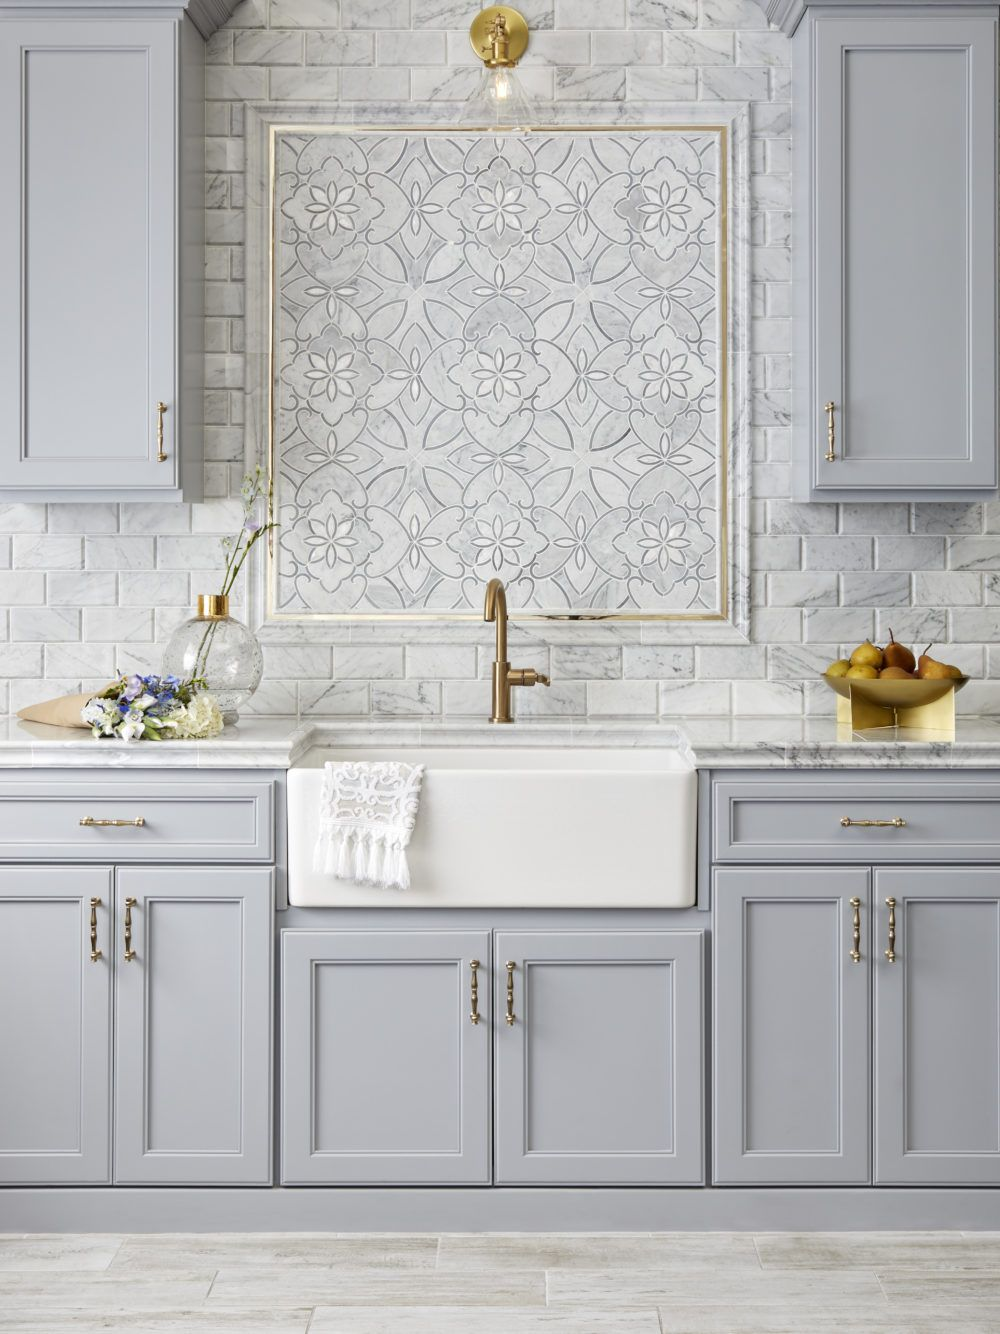 kitchen wall tiles design